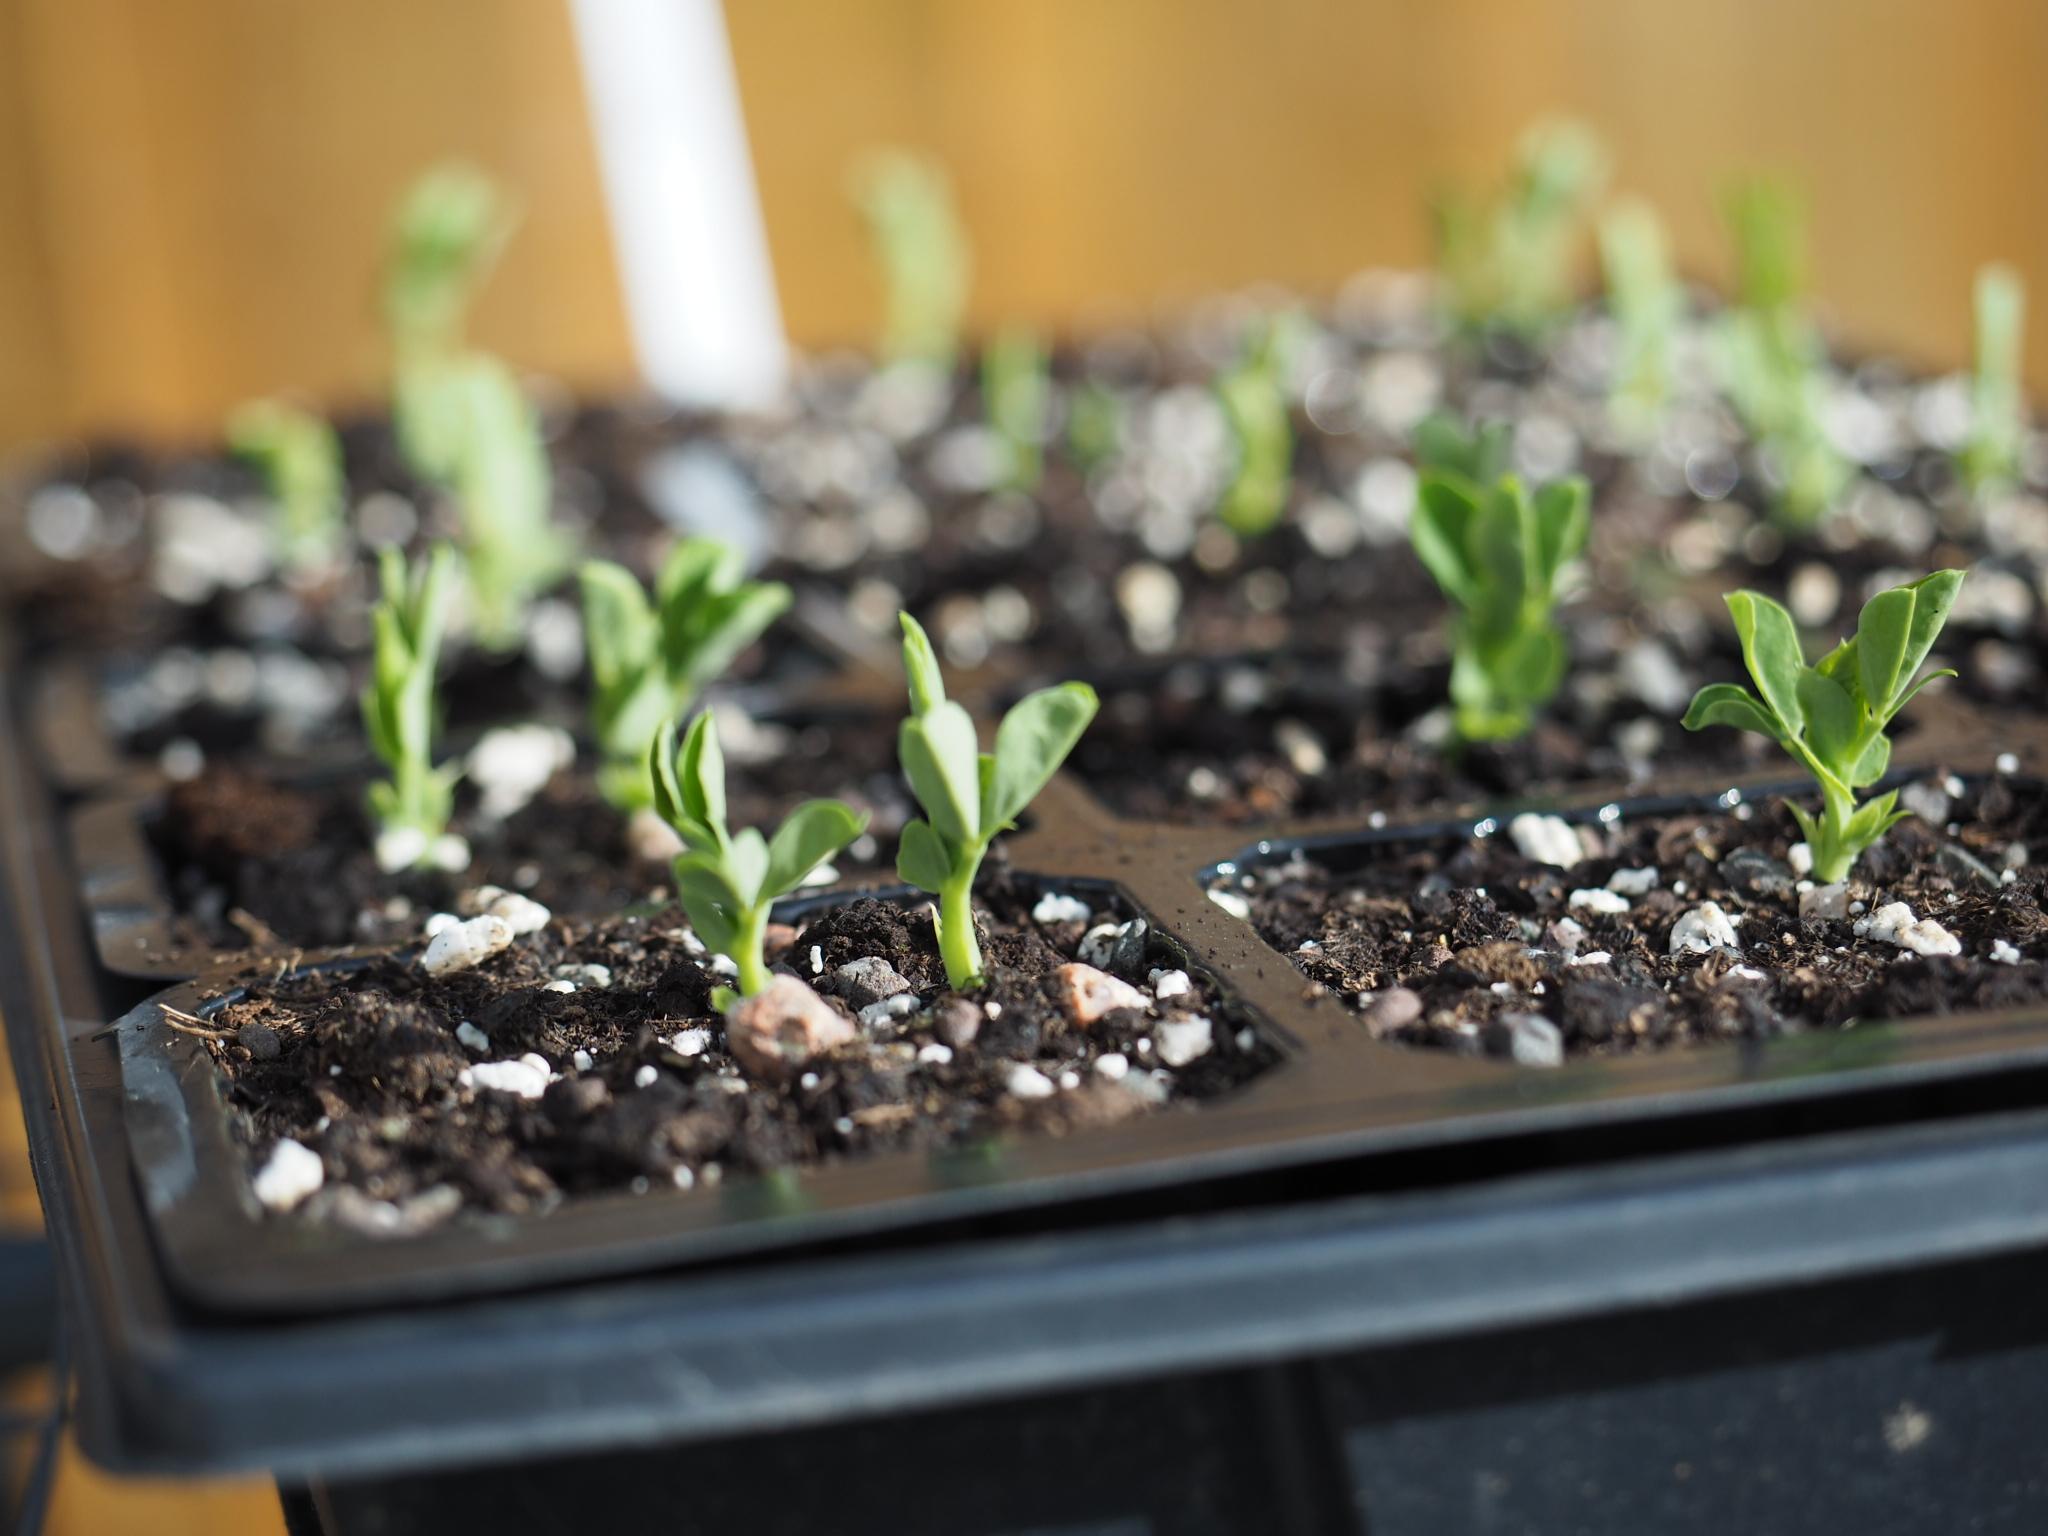 Pea seedlings emerging in the sunshine